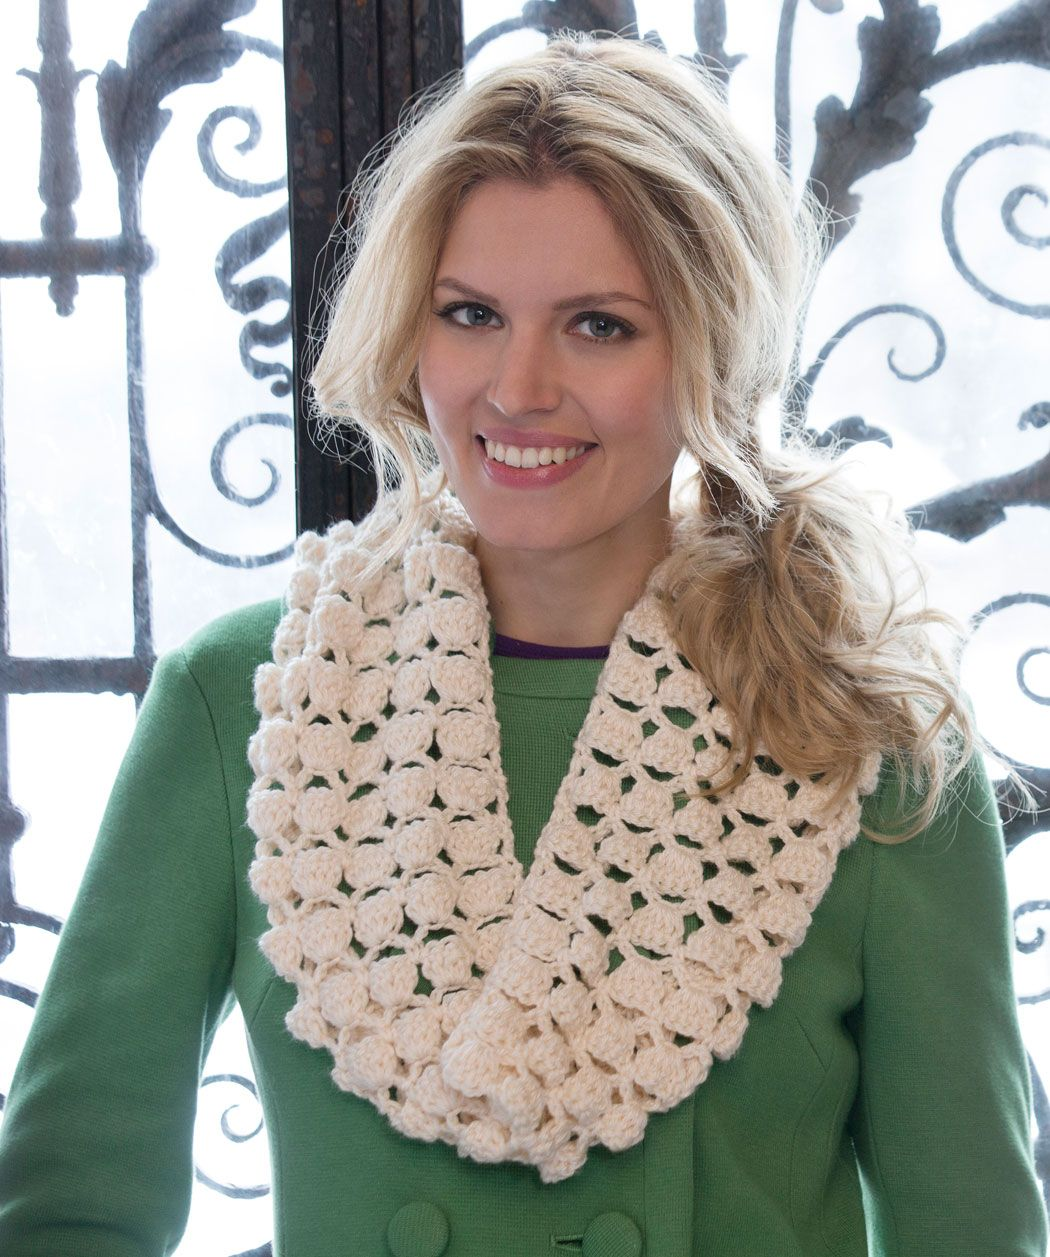 Free crochet pattern infinite shells cowl free crochet scarf infinite shells cowl by wendy lewis free crochet pattern redheart bankloansurffo Image collections